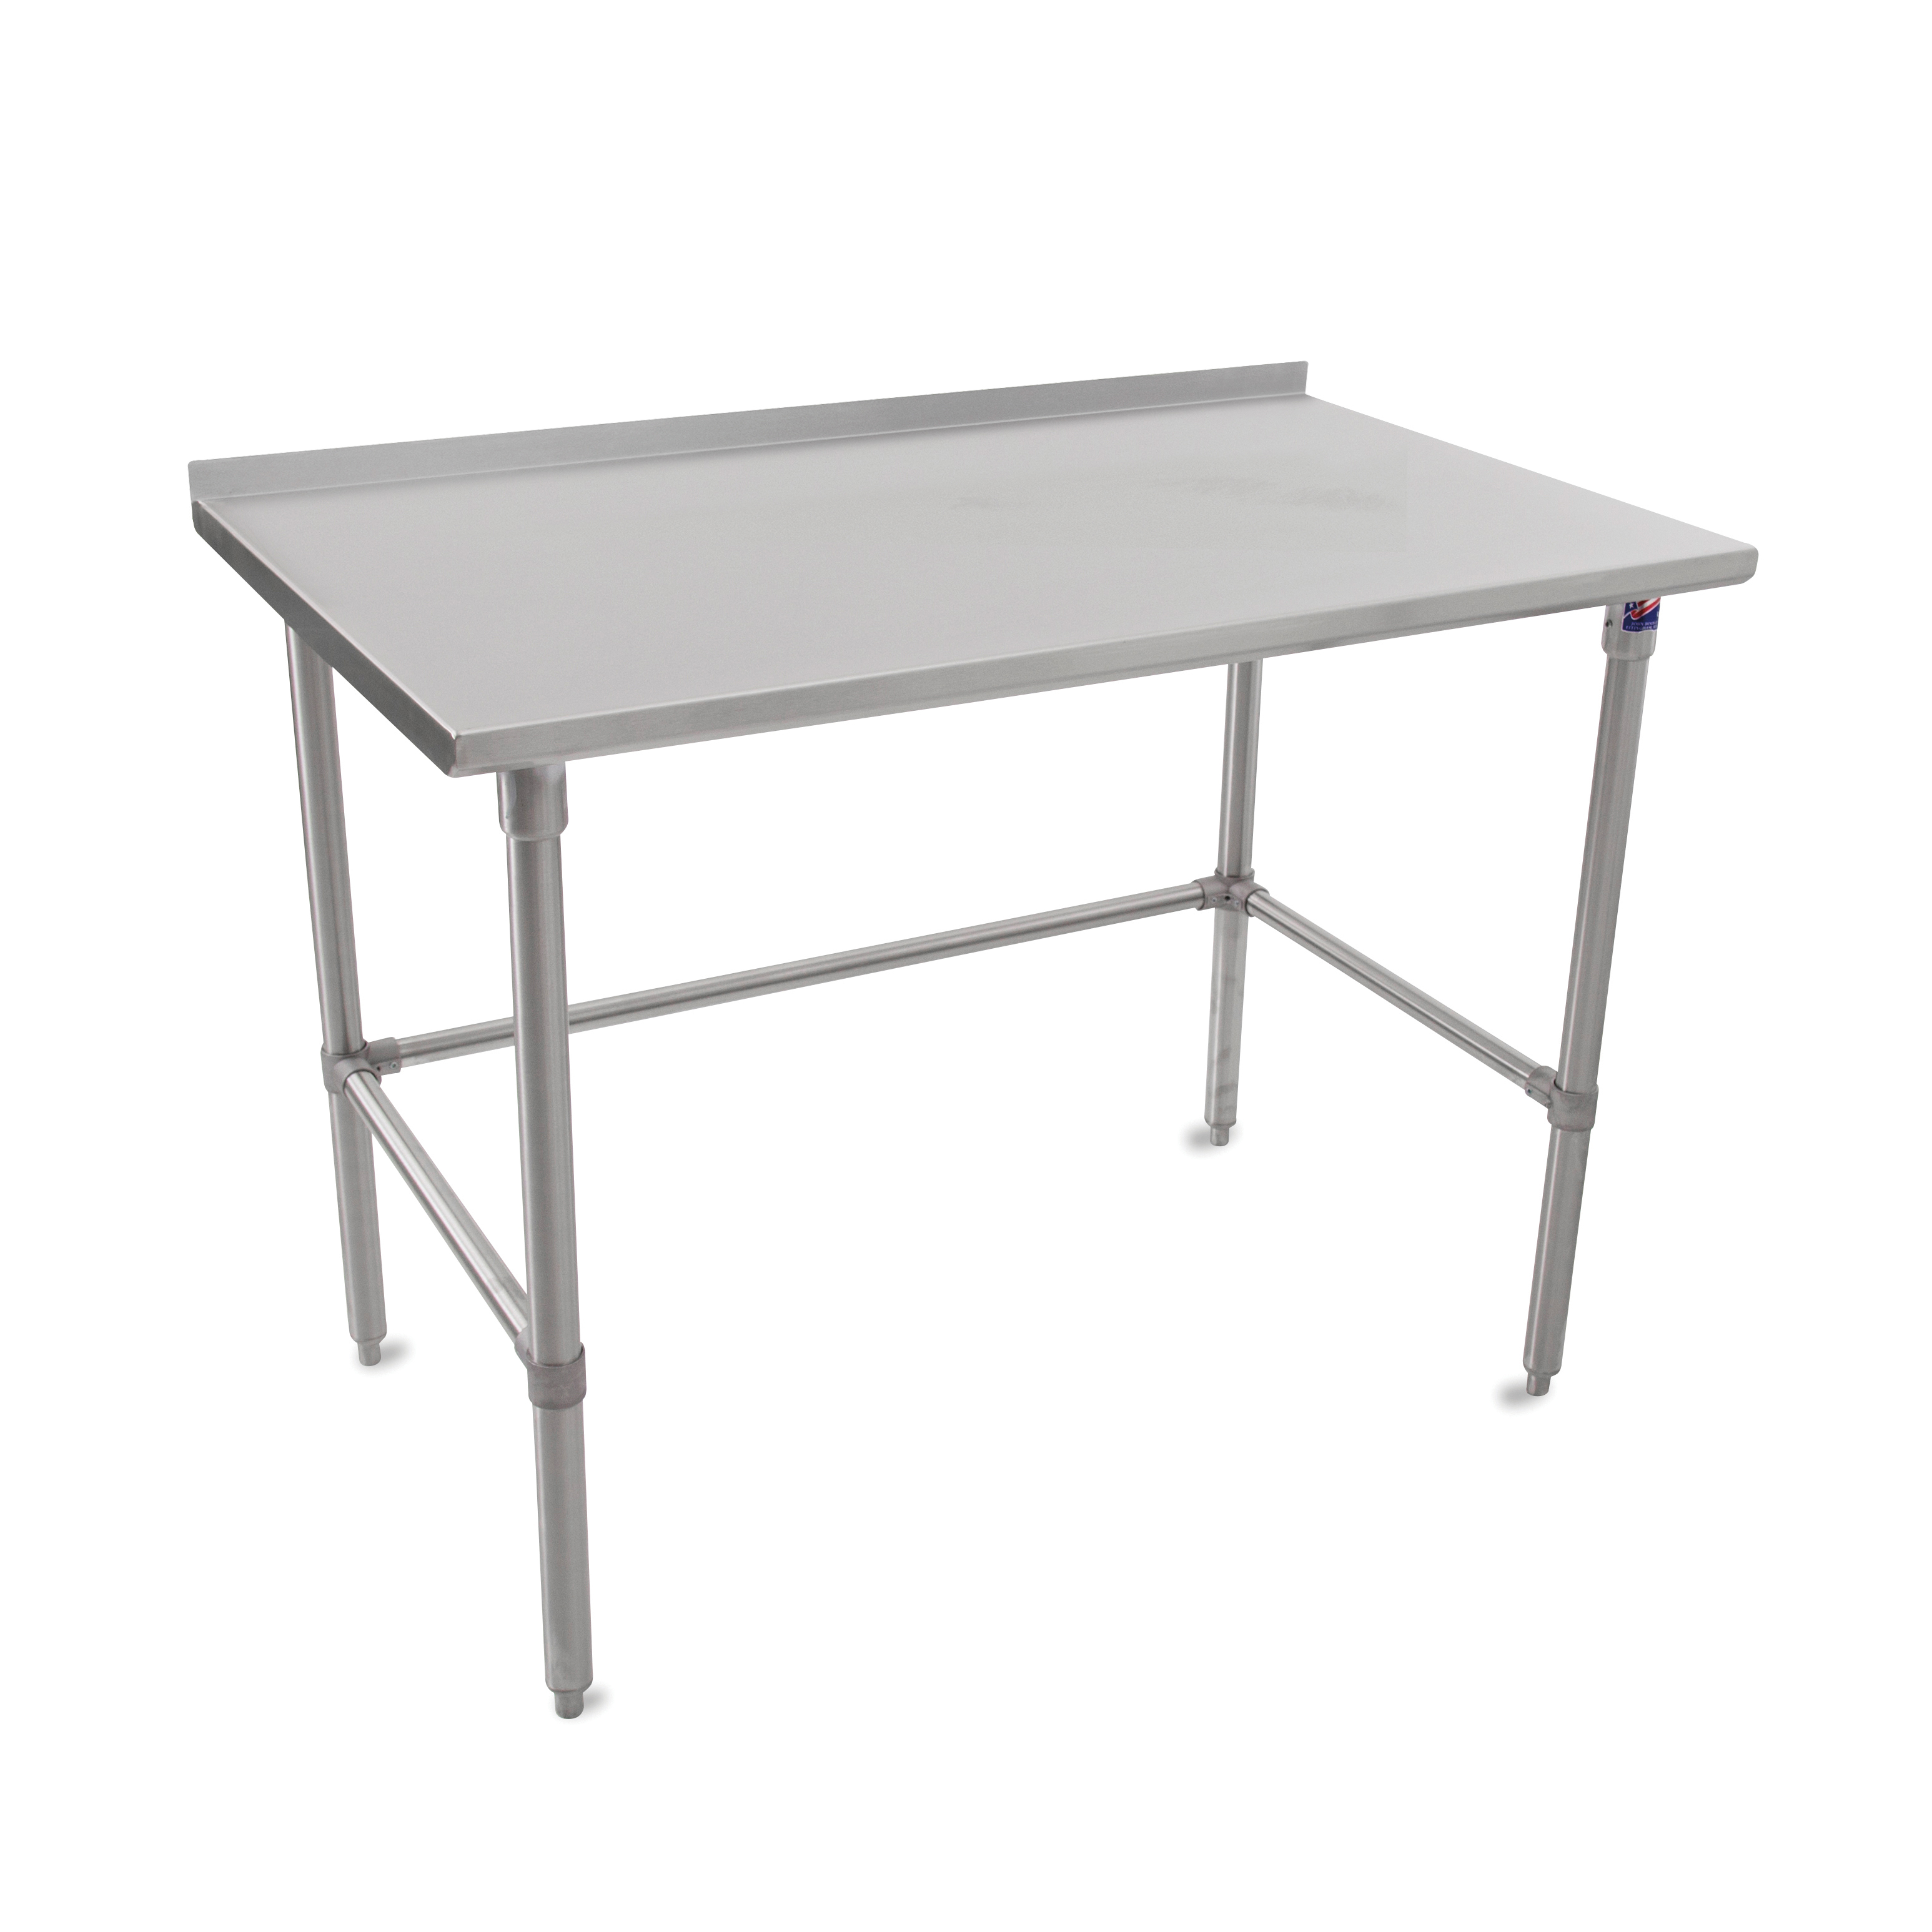 John Boos ST6R1.5-3060SBK work table,  54